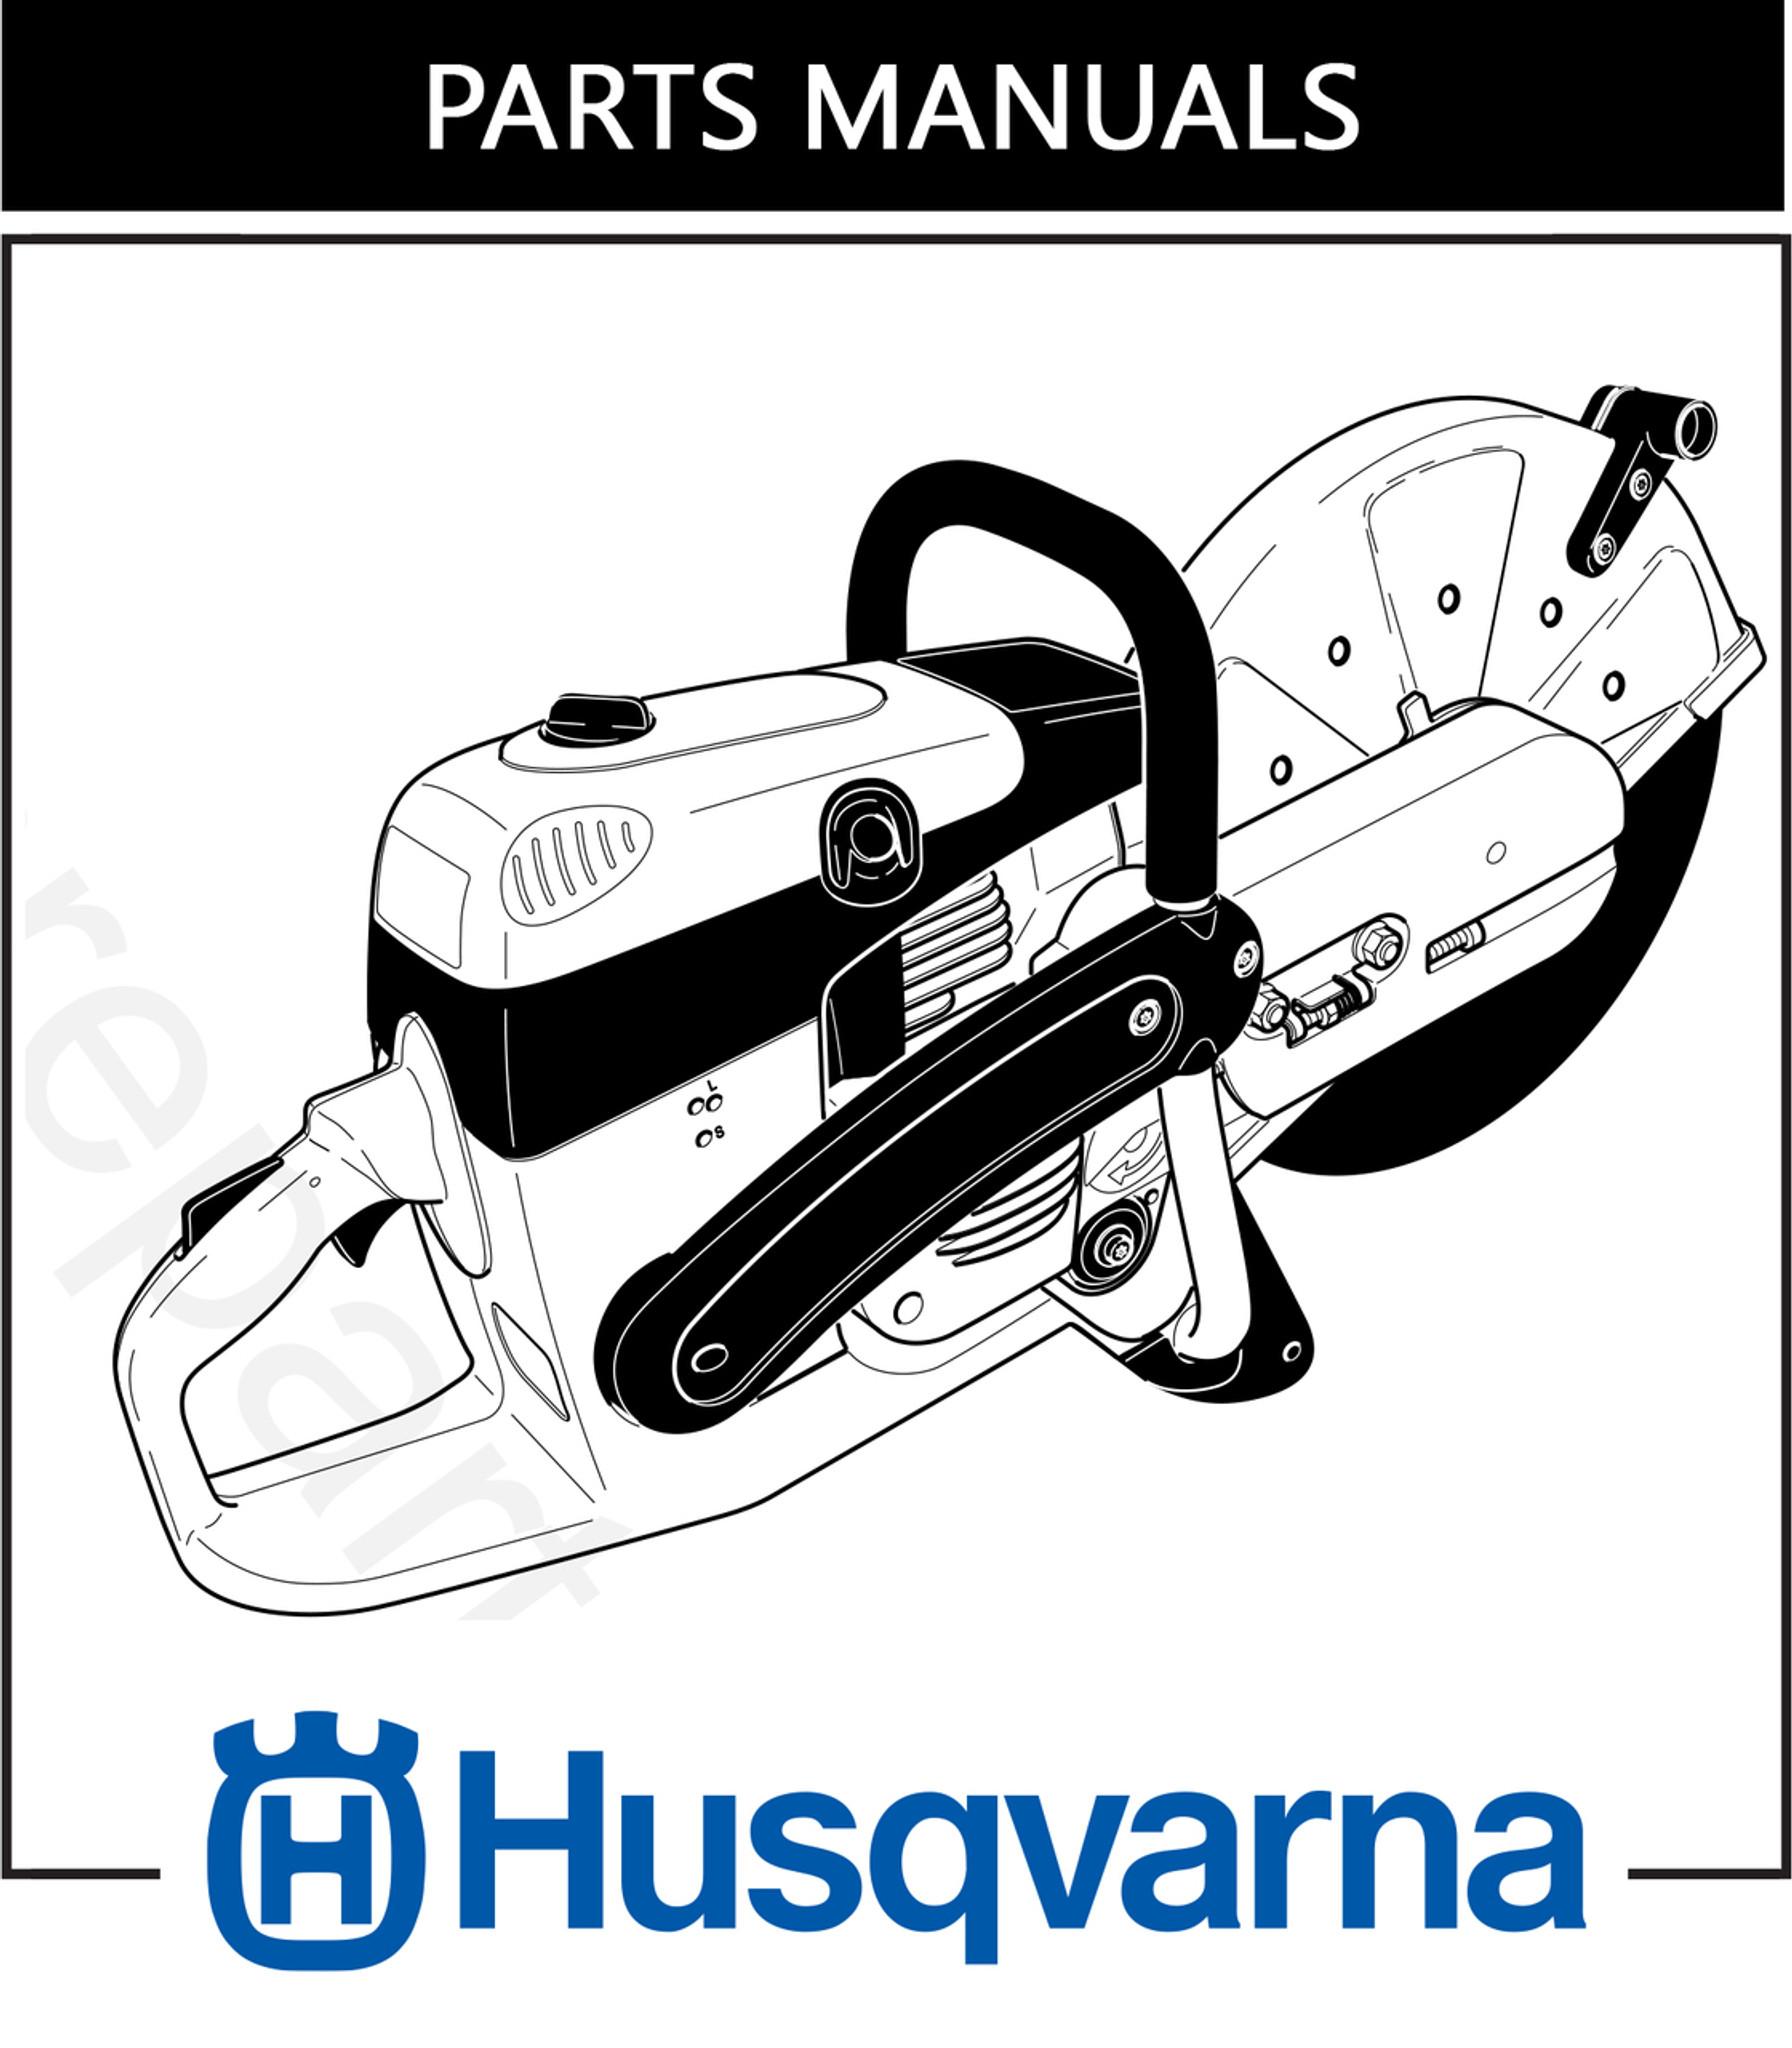 Parts Manual | Husqvarna K760 | Free Download - DHS Equipment